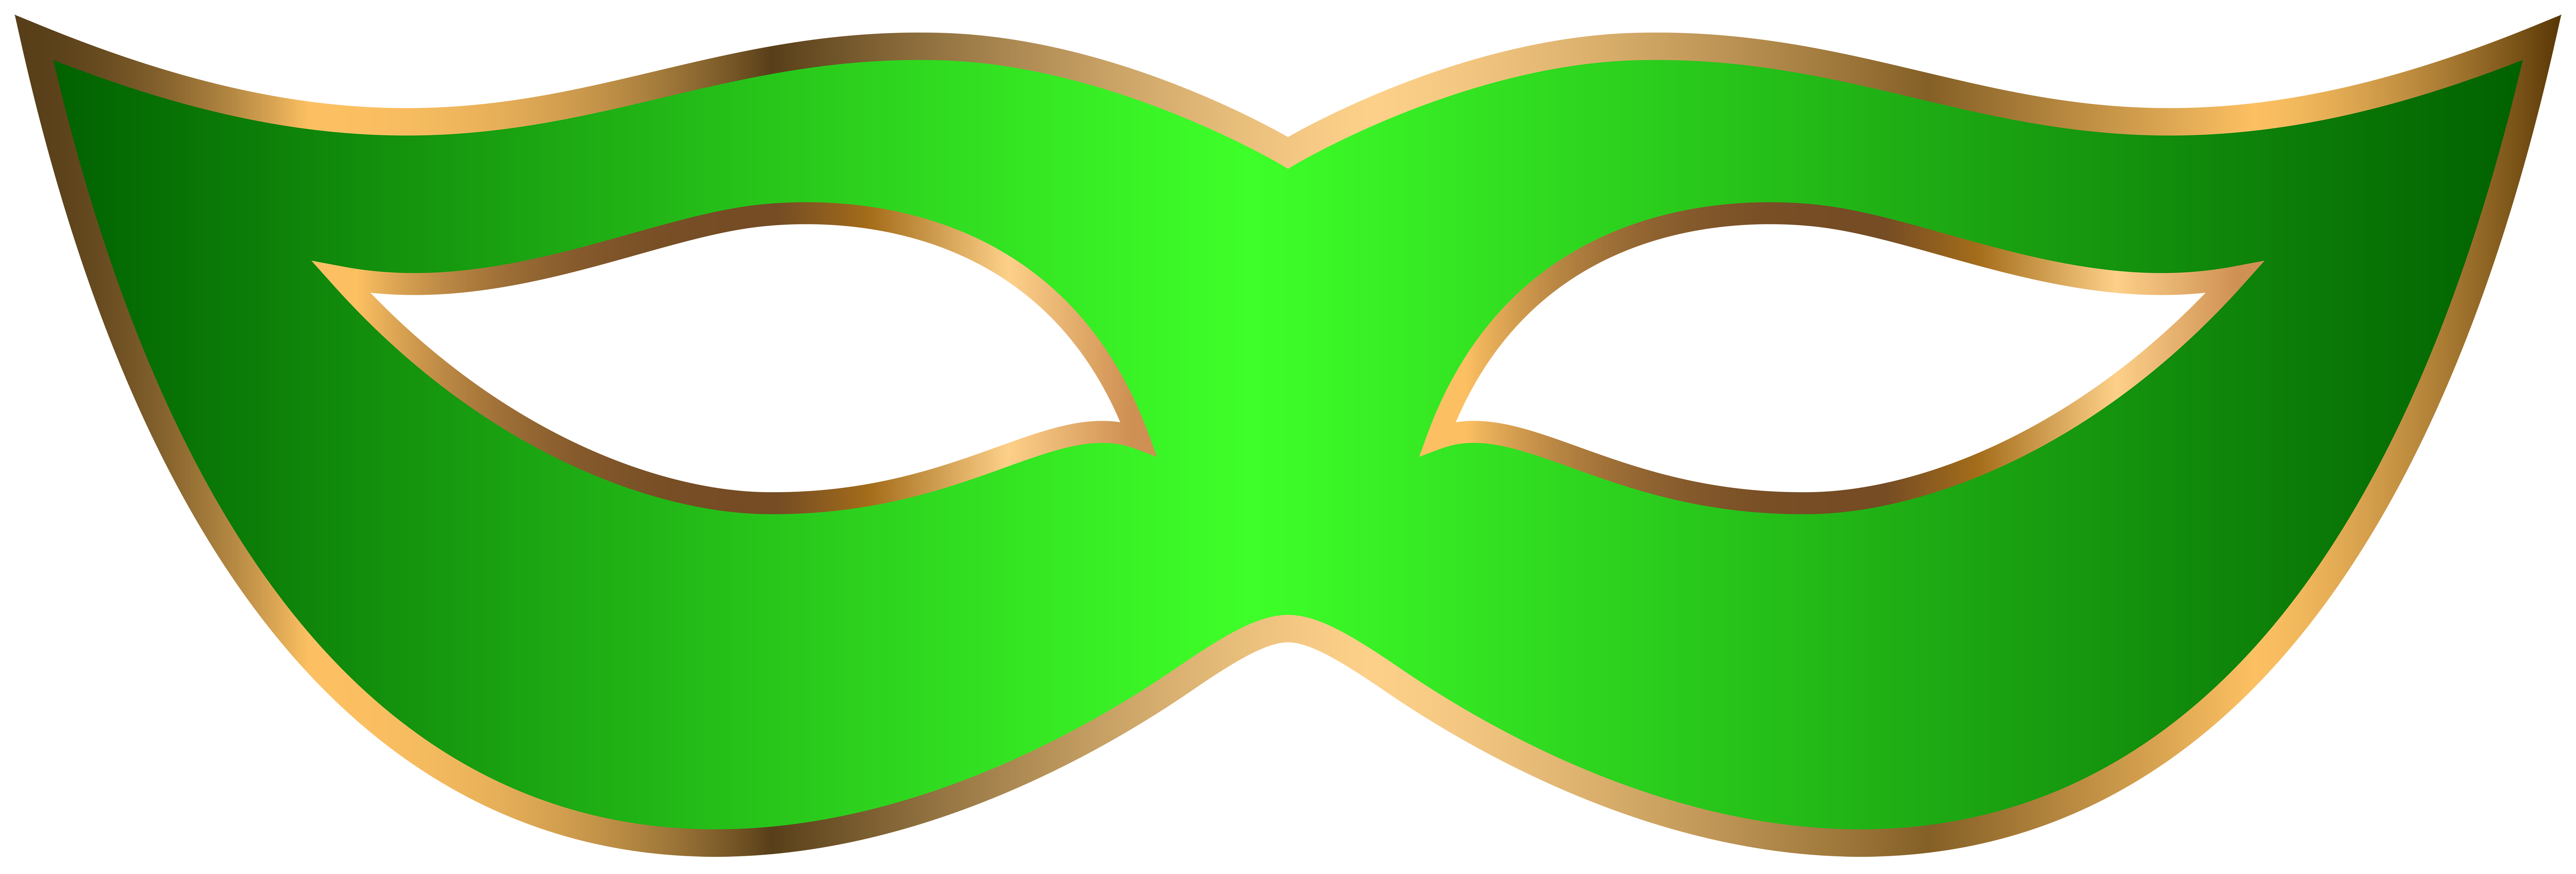 8000x2715 Green Carnival Mask Png Clip Art Transparent Imageu200b Gallery